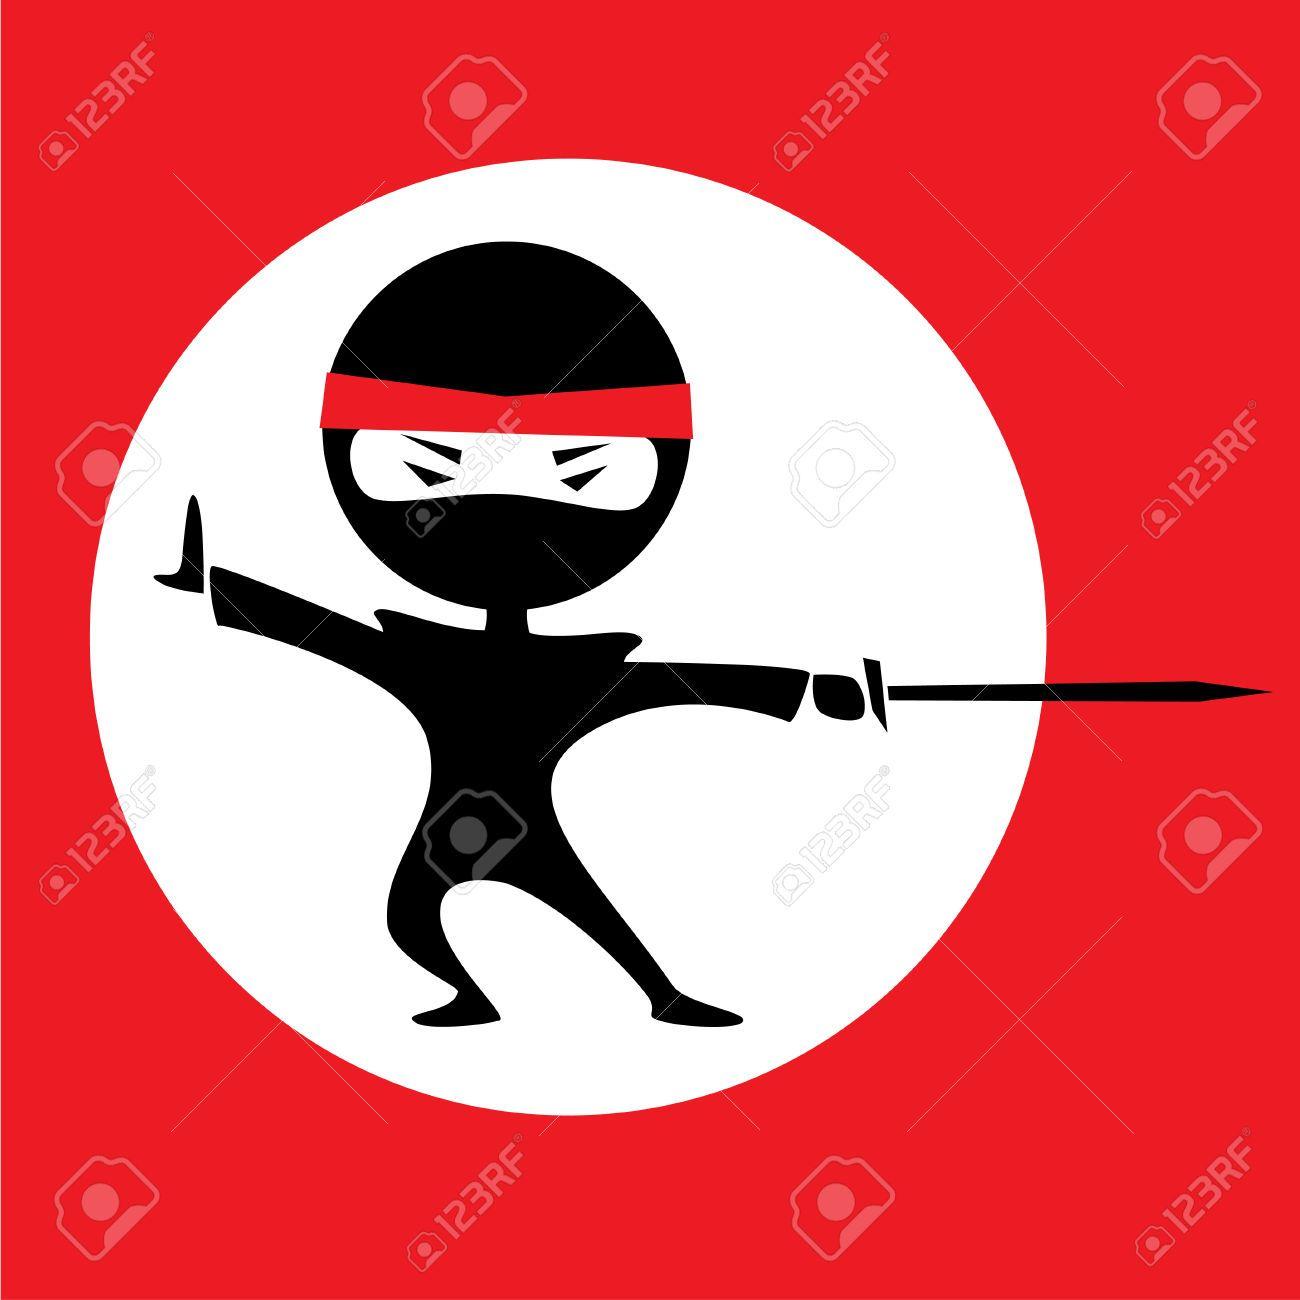 1300x1300 Vector Illustration Of A Cartoon Ninja Holding A Sword. Red